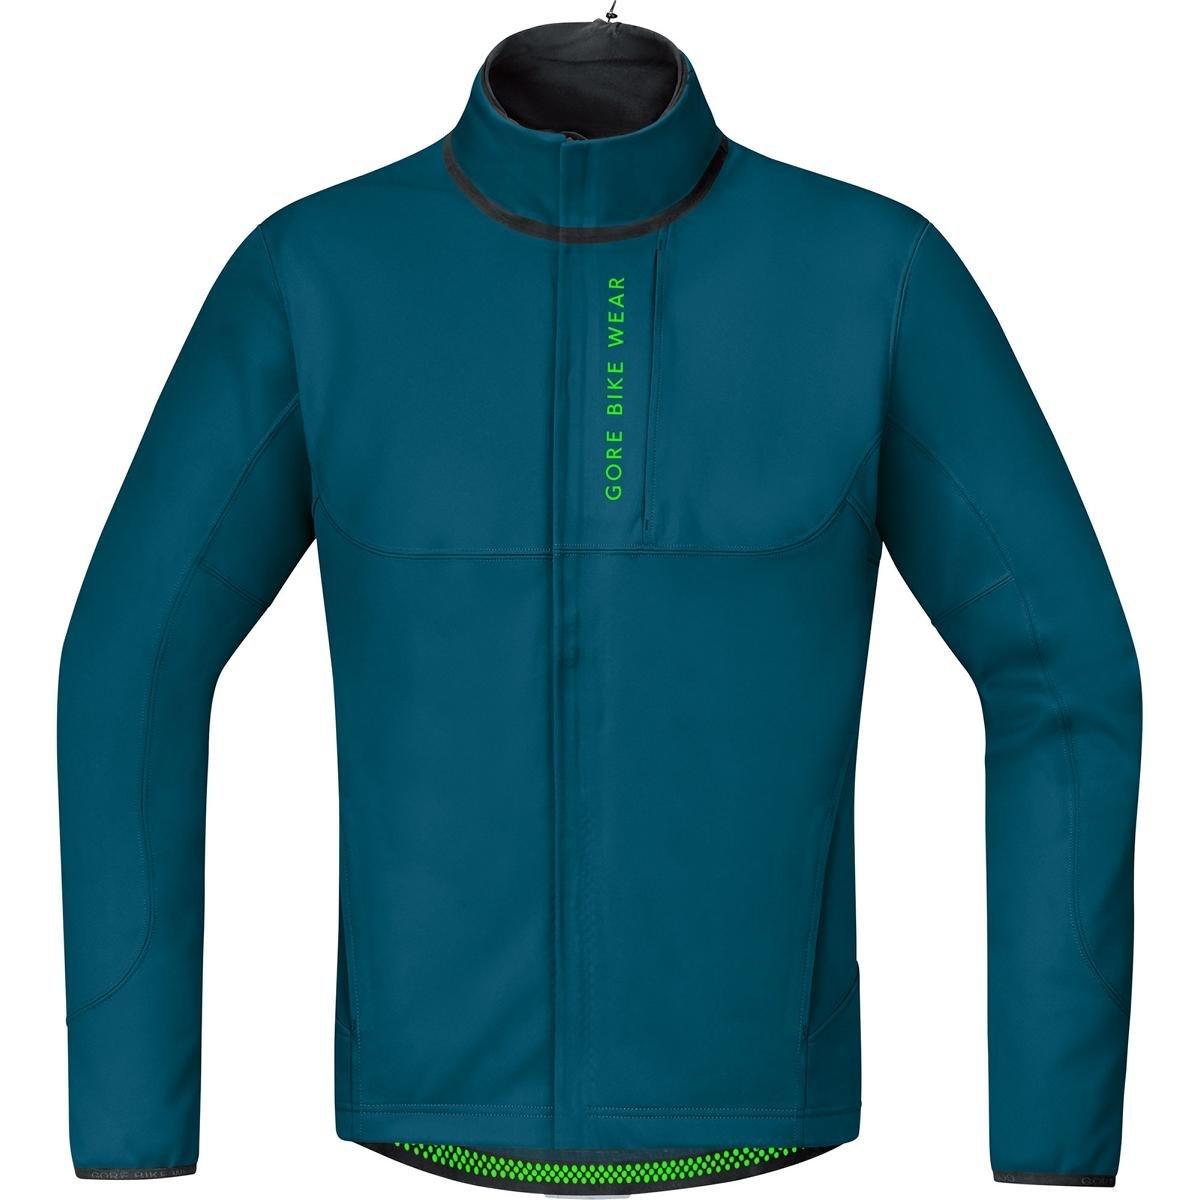 Amazon.com : GORE BIKE WEAR Power Trail Windstopper Soft Shell Thermo Jacket : Sports & Outdoors